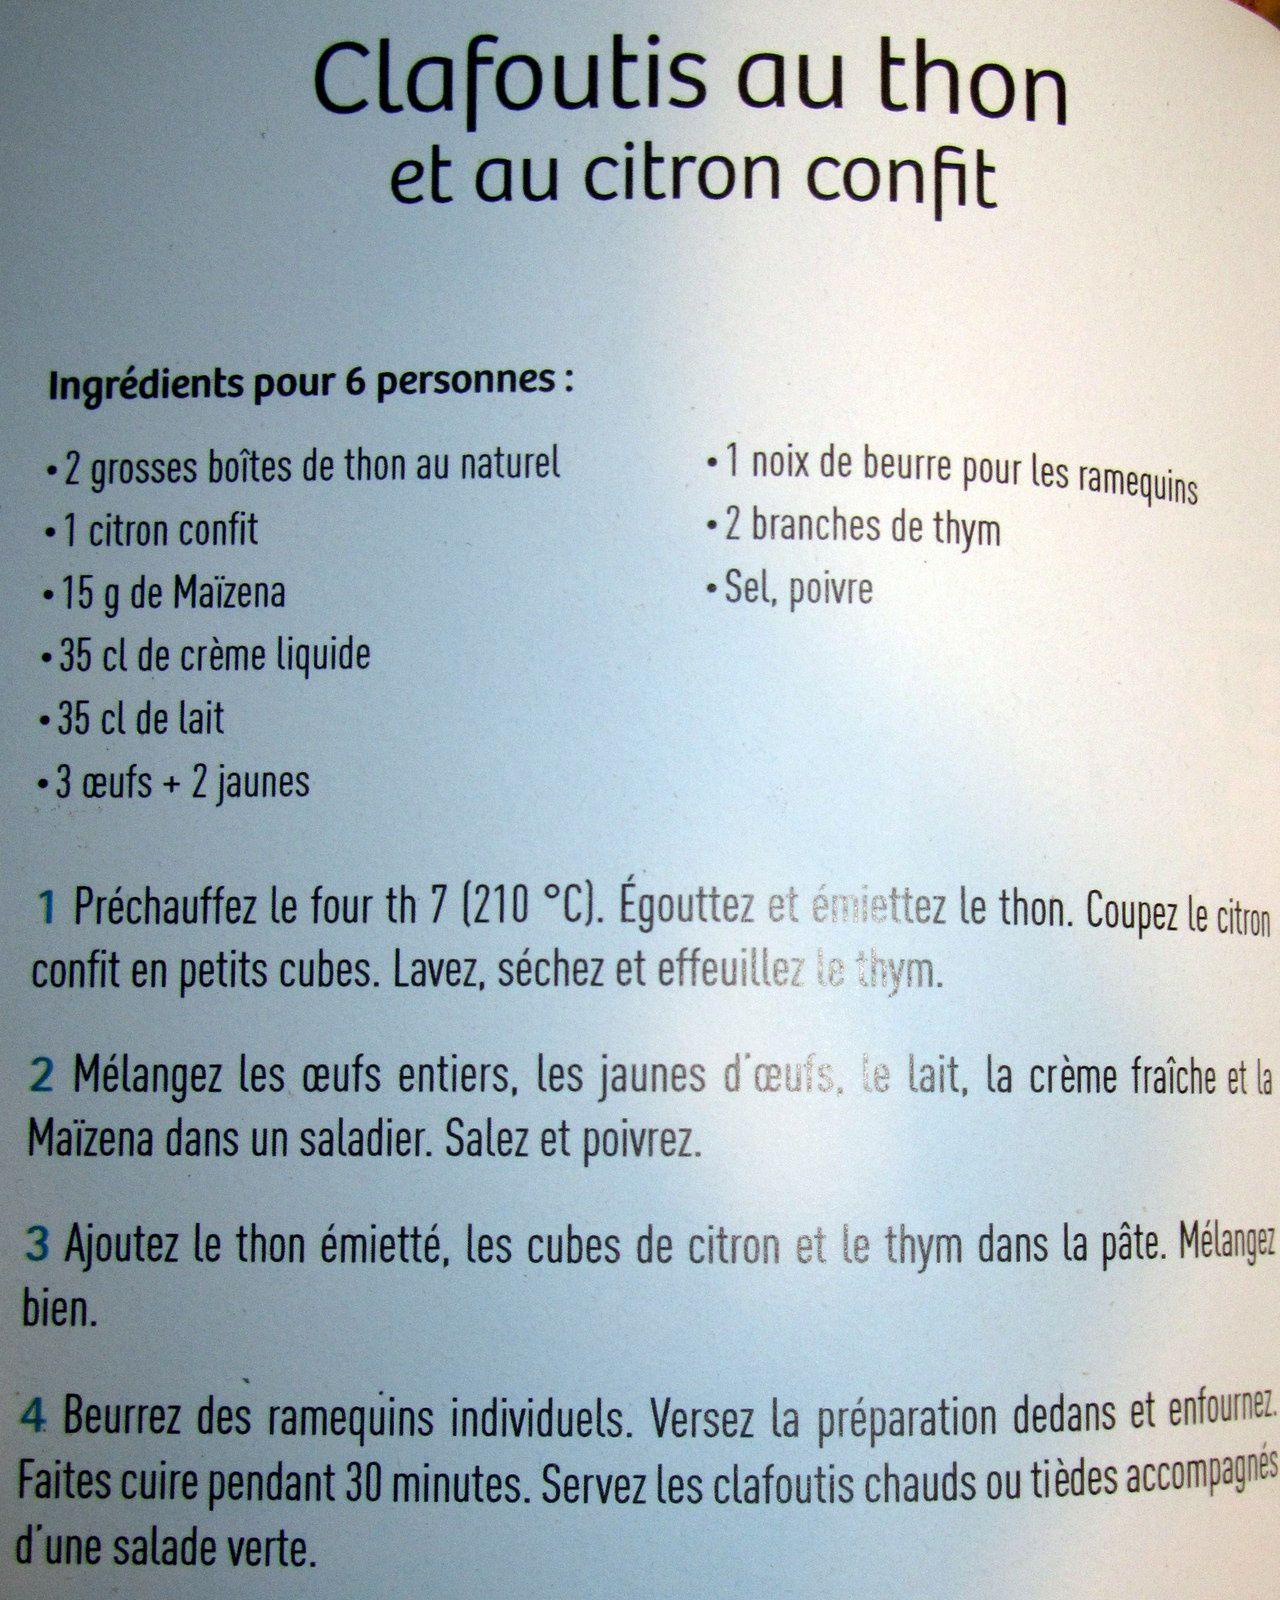 Clafoutis au thon - recette facile ...